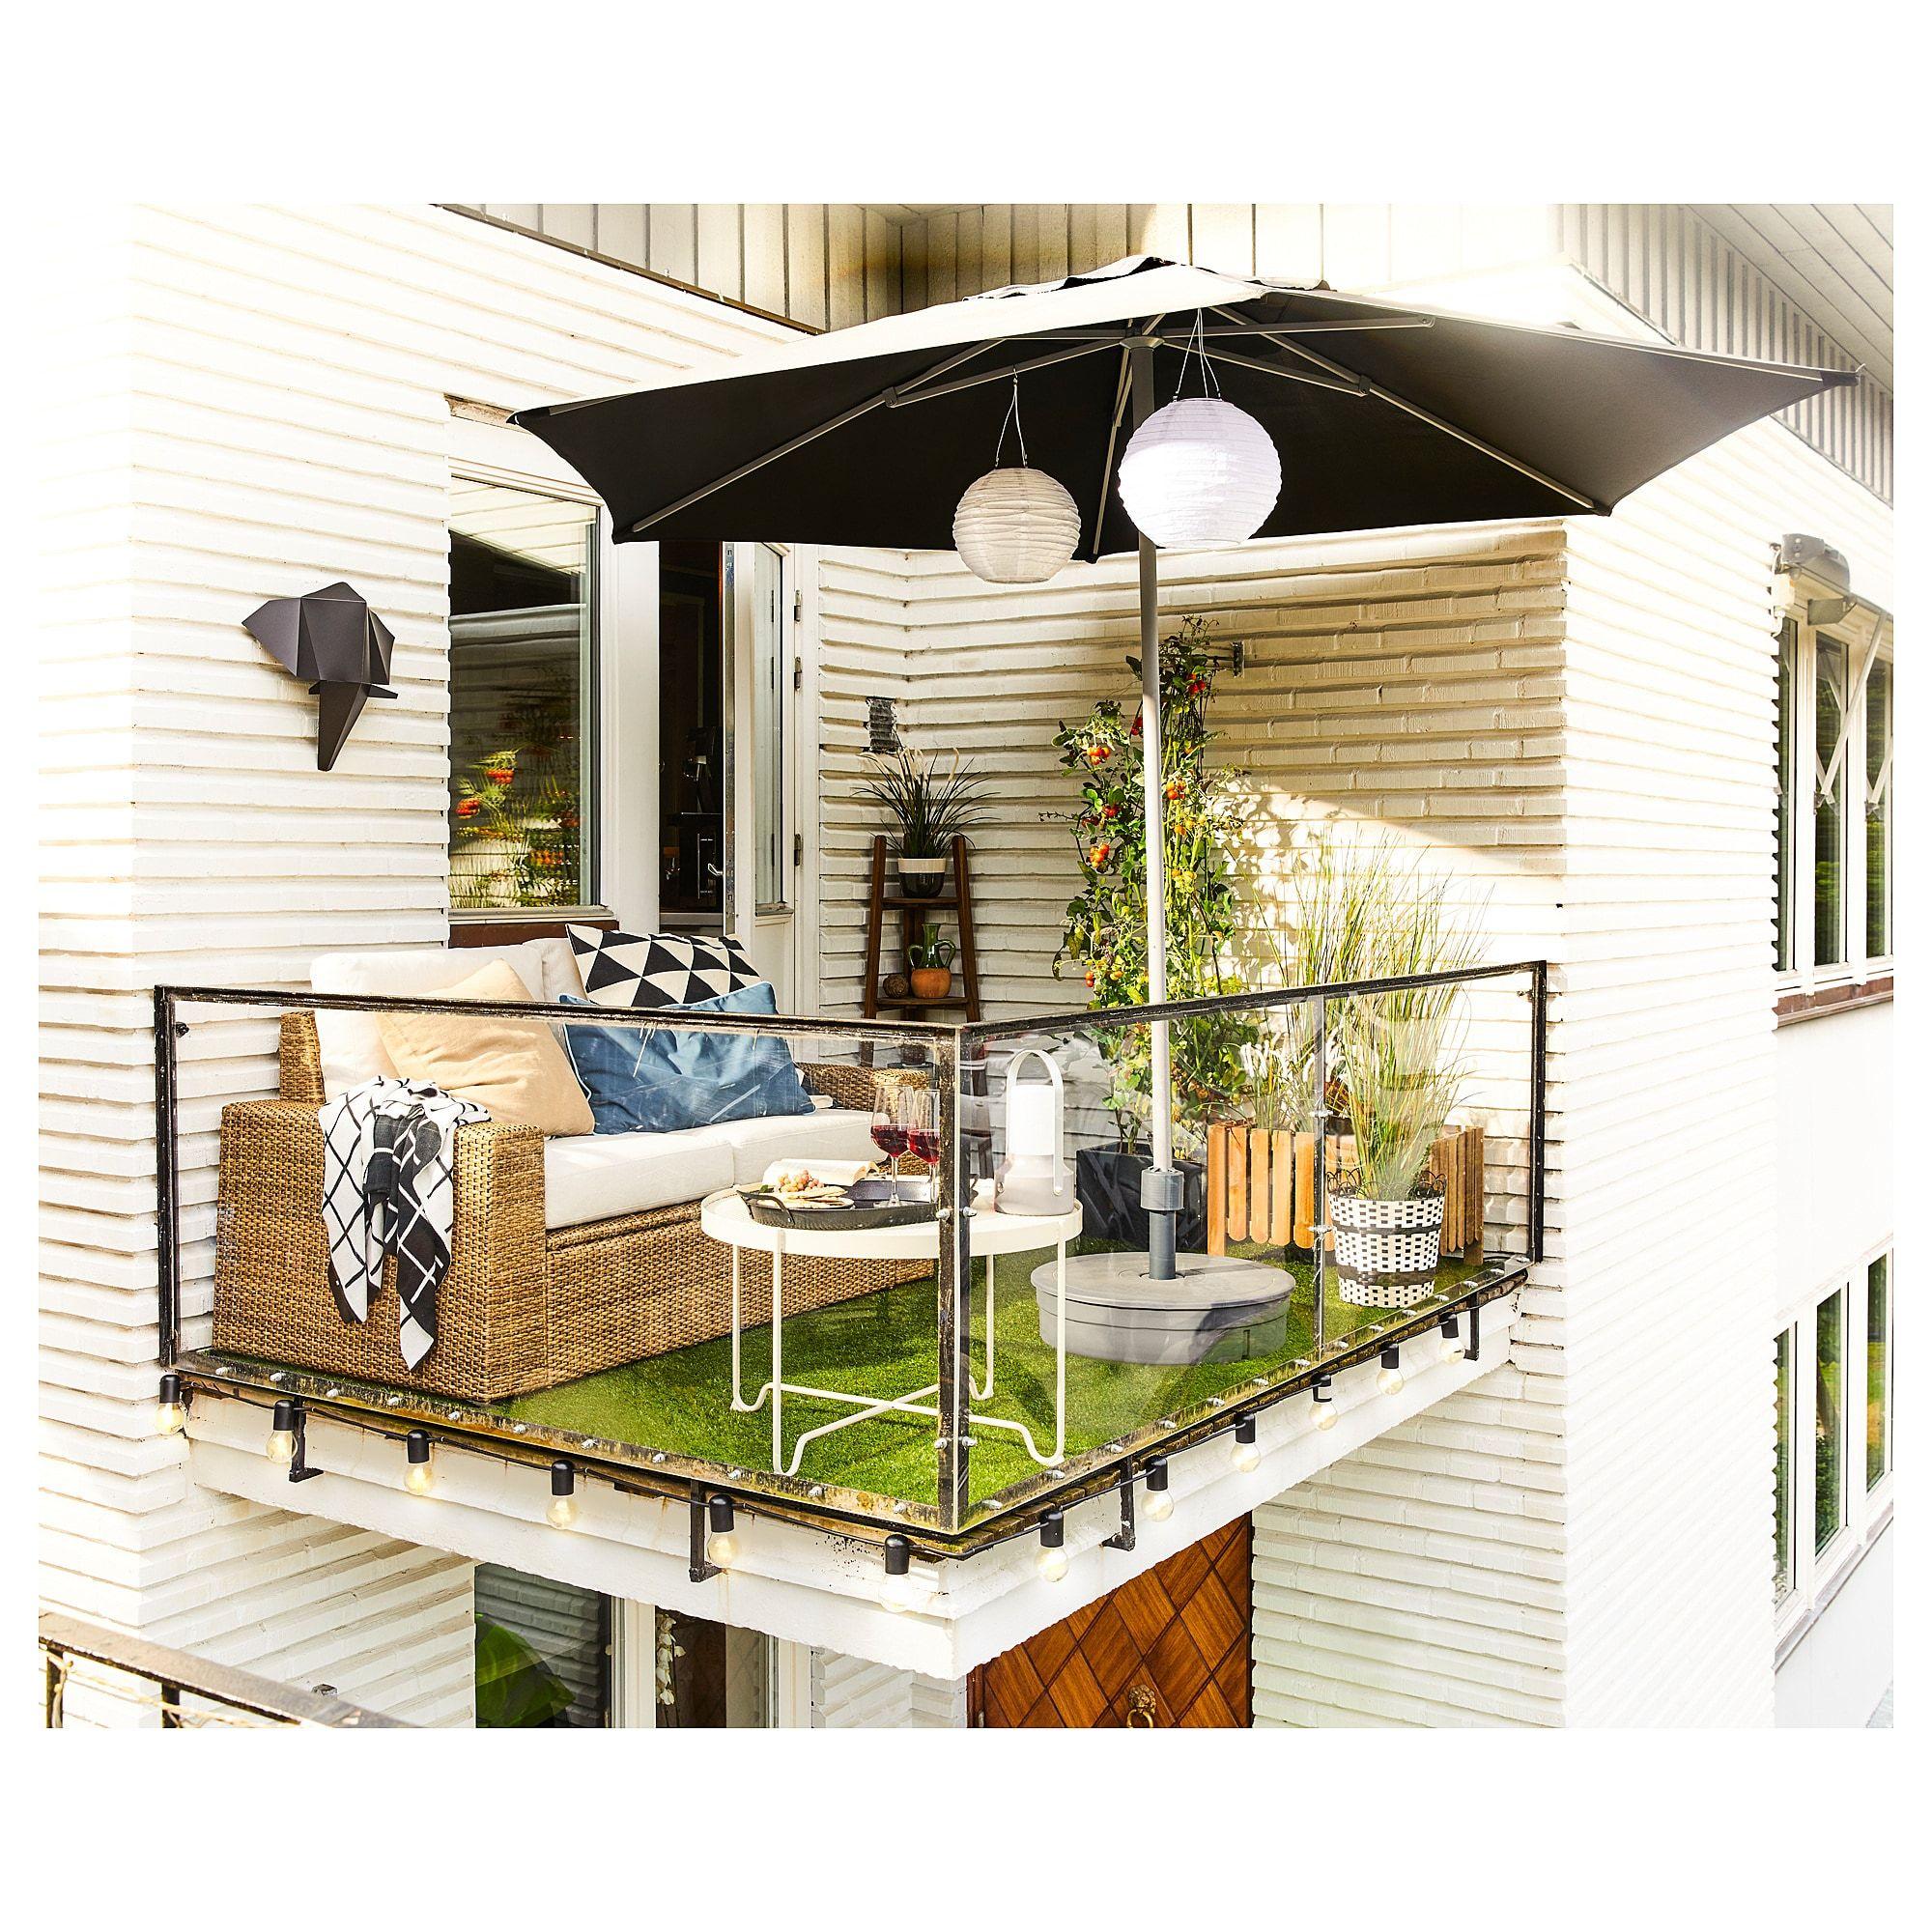 Arredare Il Balcone Ikea krokholmen coffee table, outdoor - beige (with images